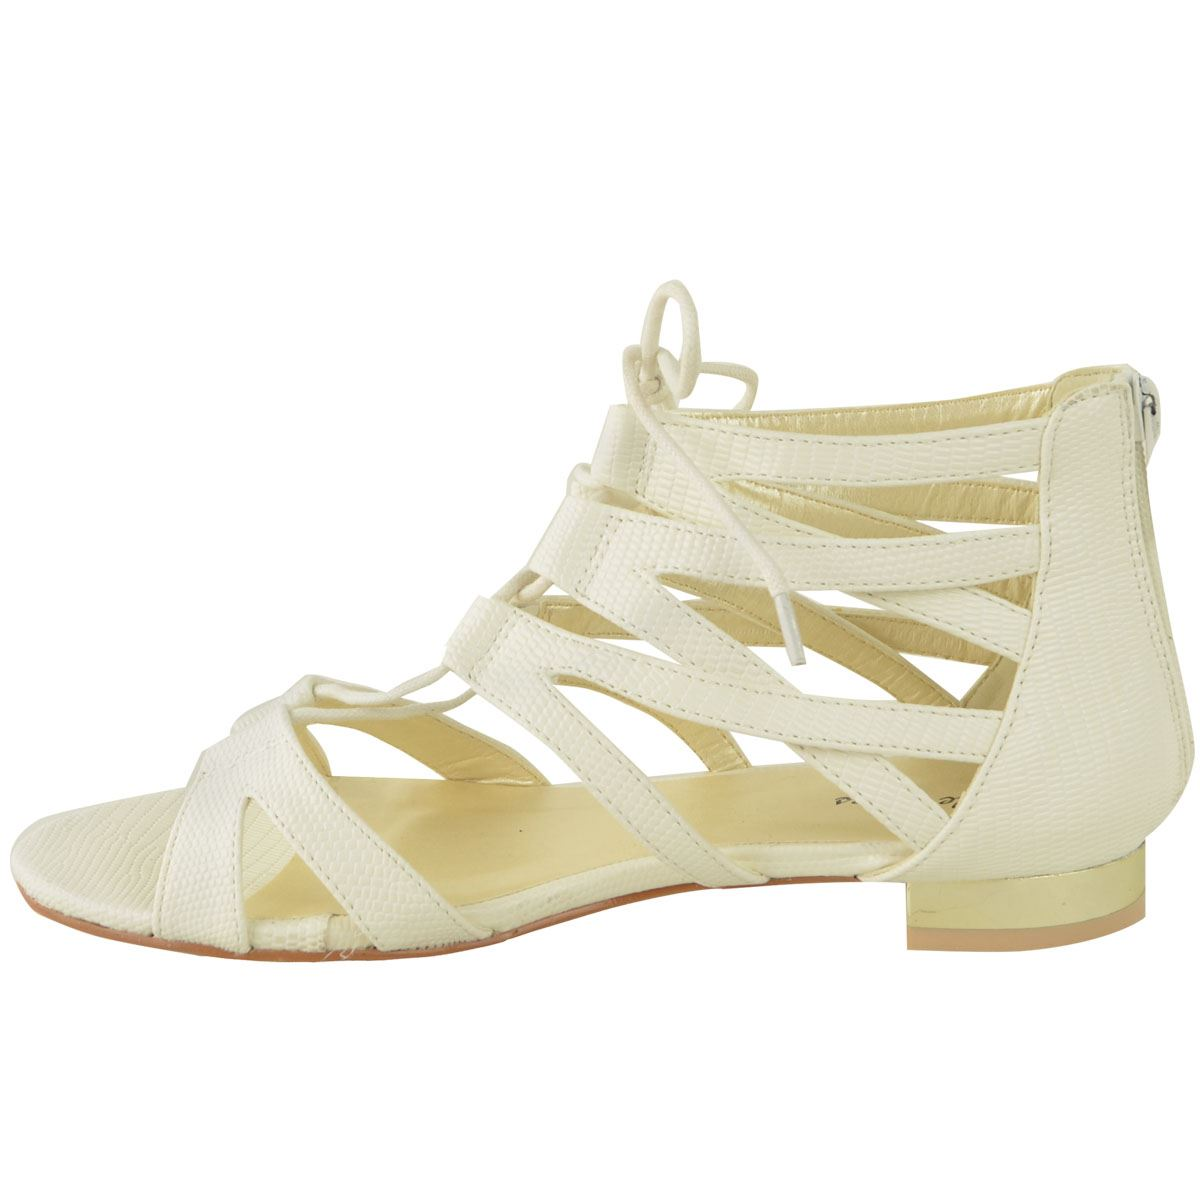 Wonderful Clothes Shoes Amp Accessories Gt Women39s Shoes Gt Flats